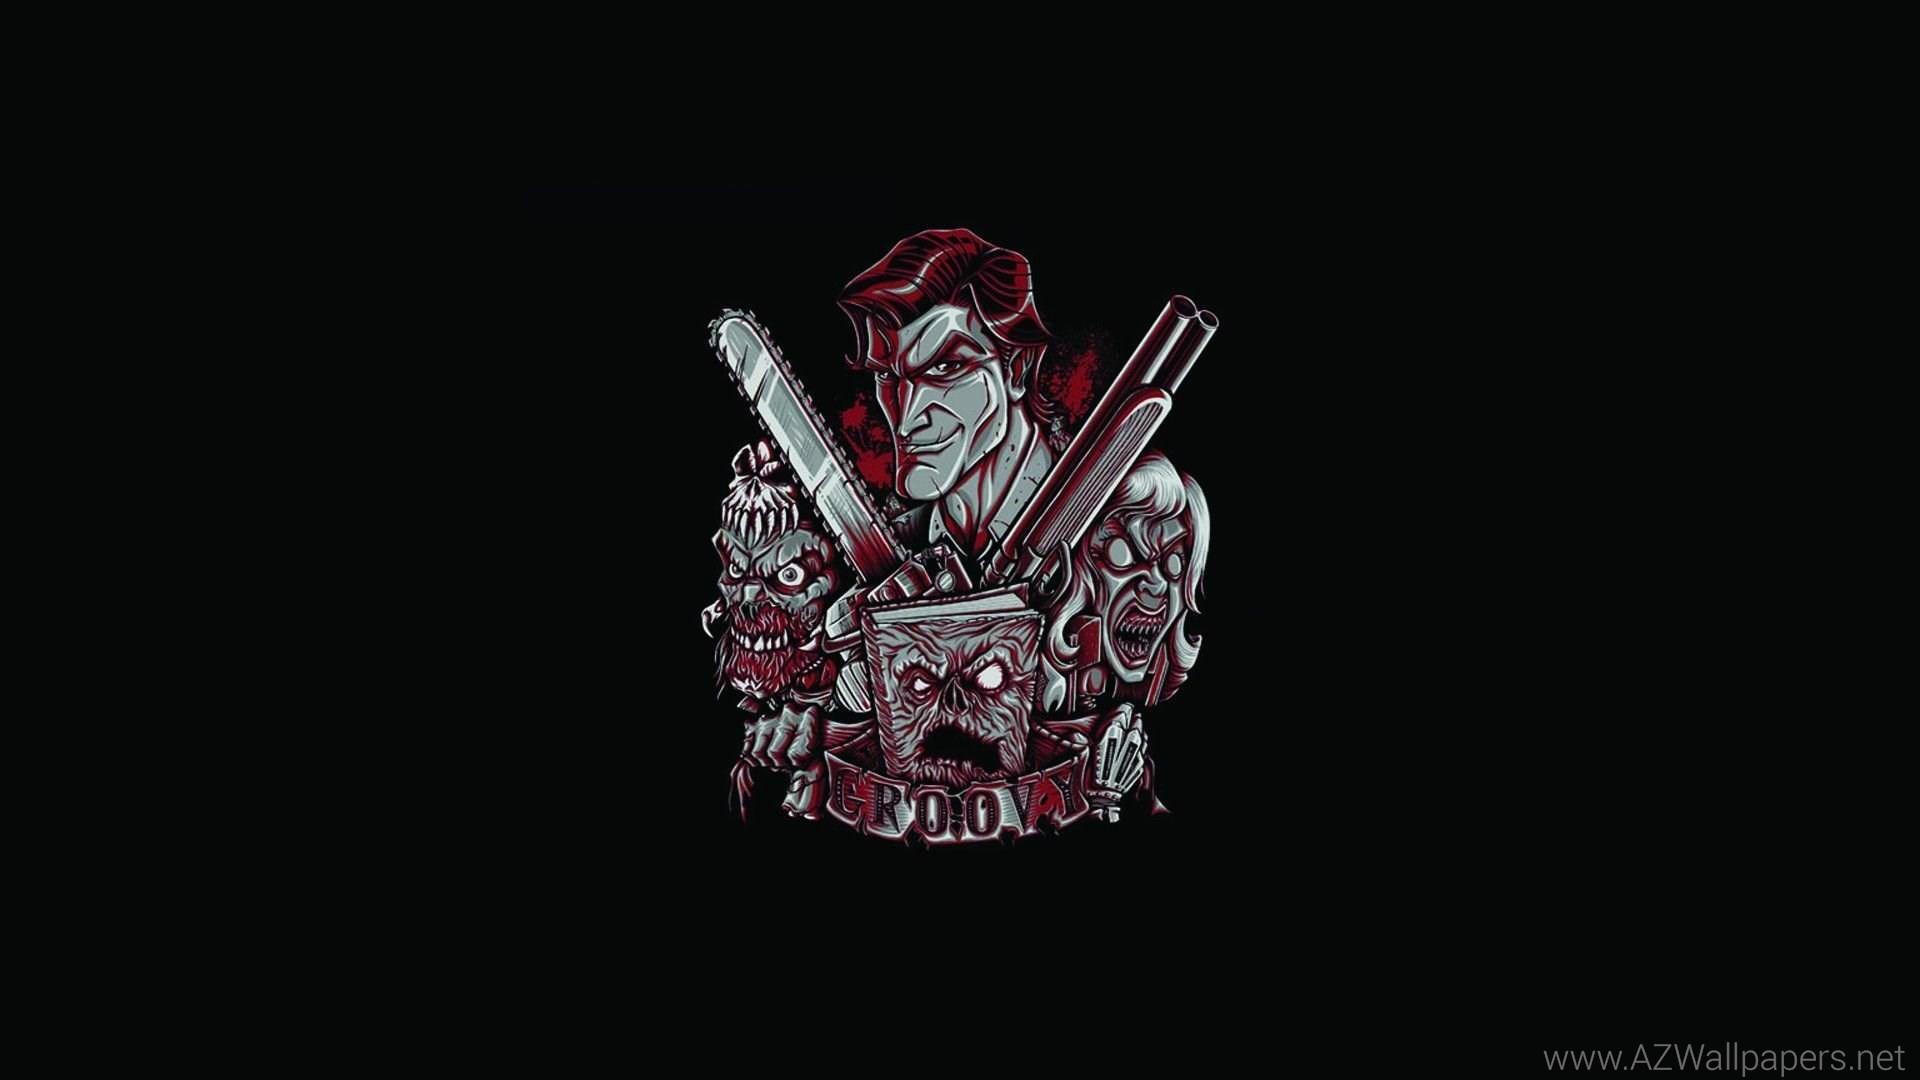 Evil Dead Black Army Of Darkness Dark Zombie Wallpapers